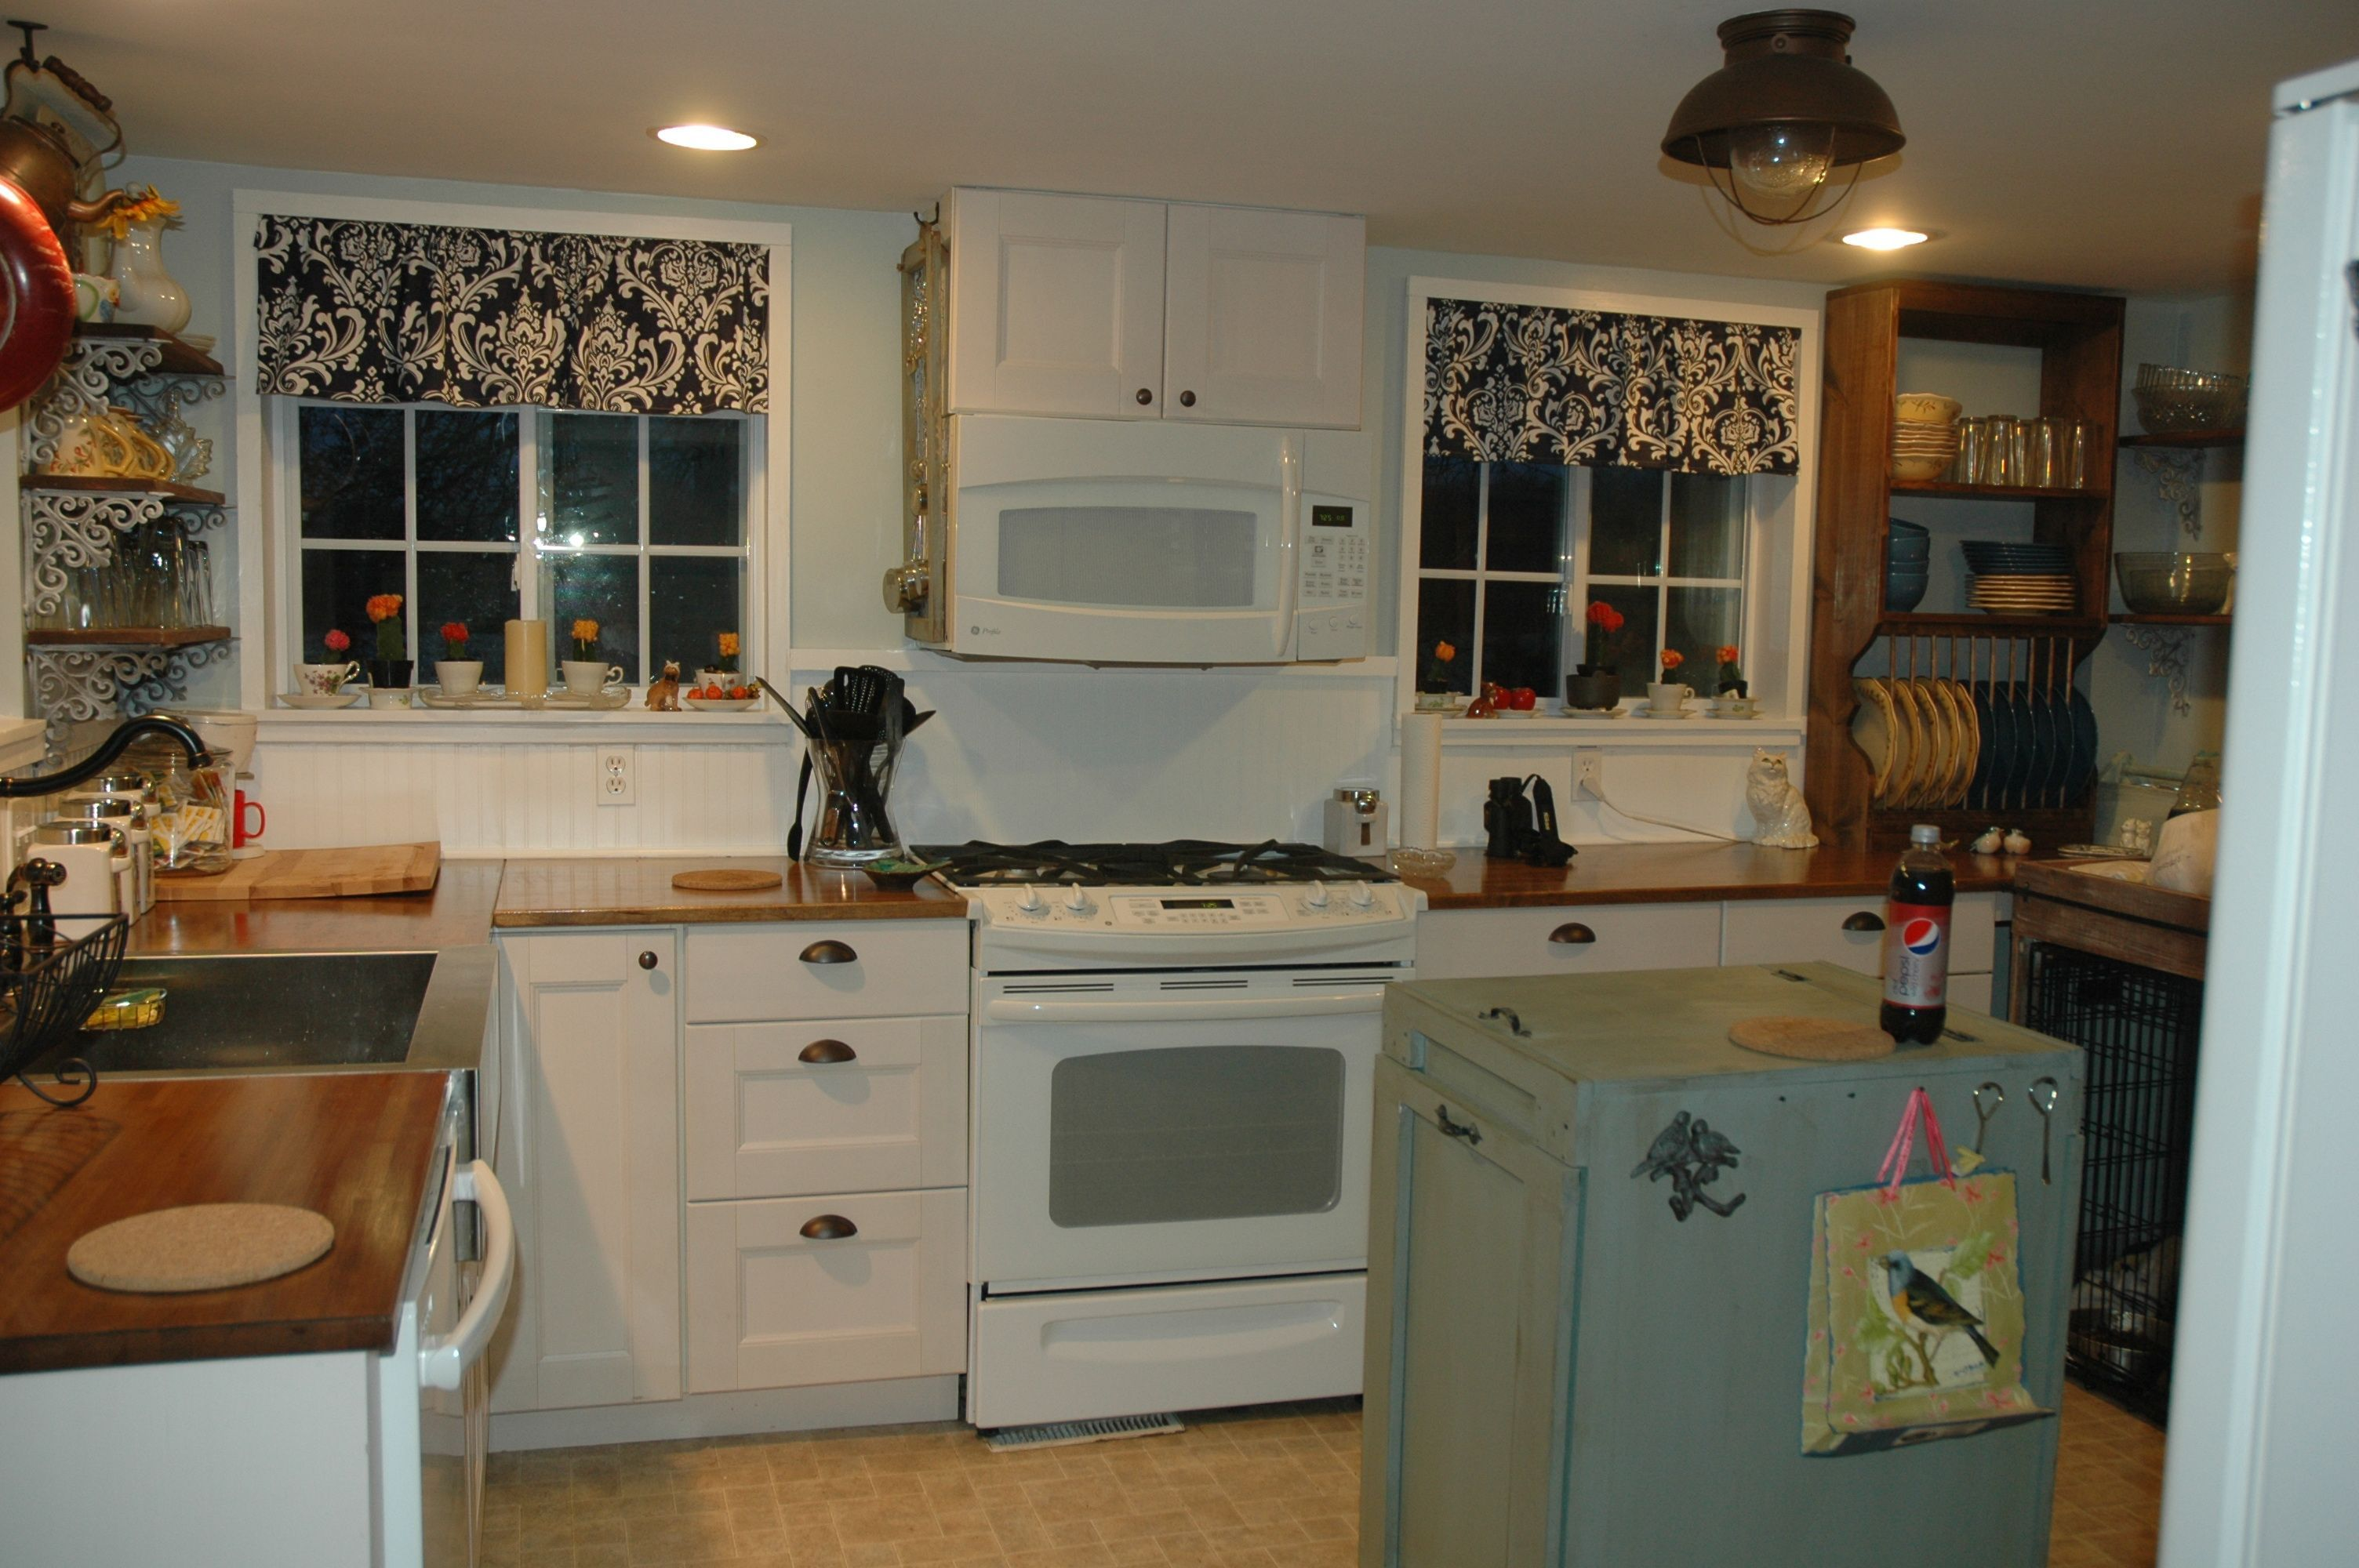 Wood counters beadboard backsplash open shelving plate rack tilt